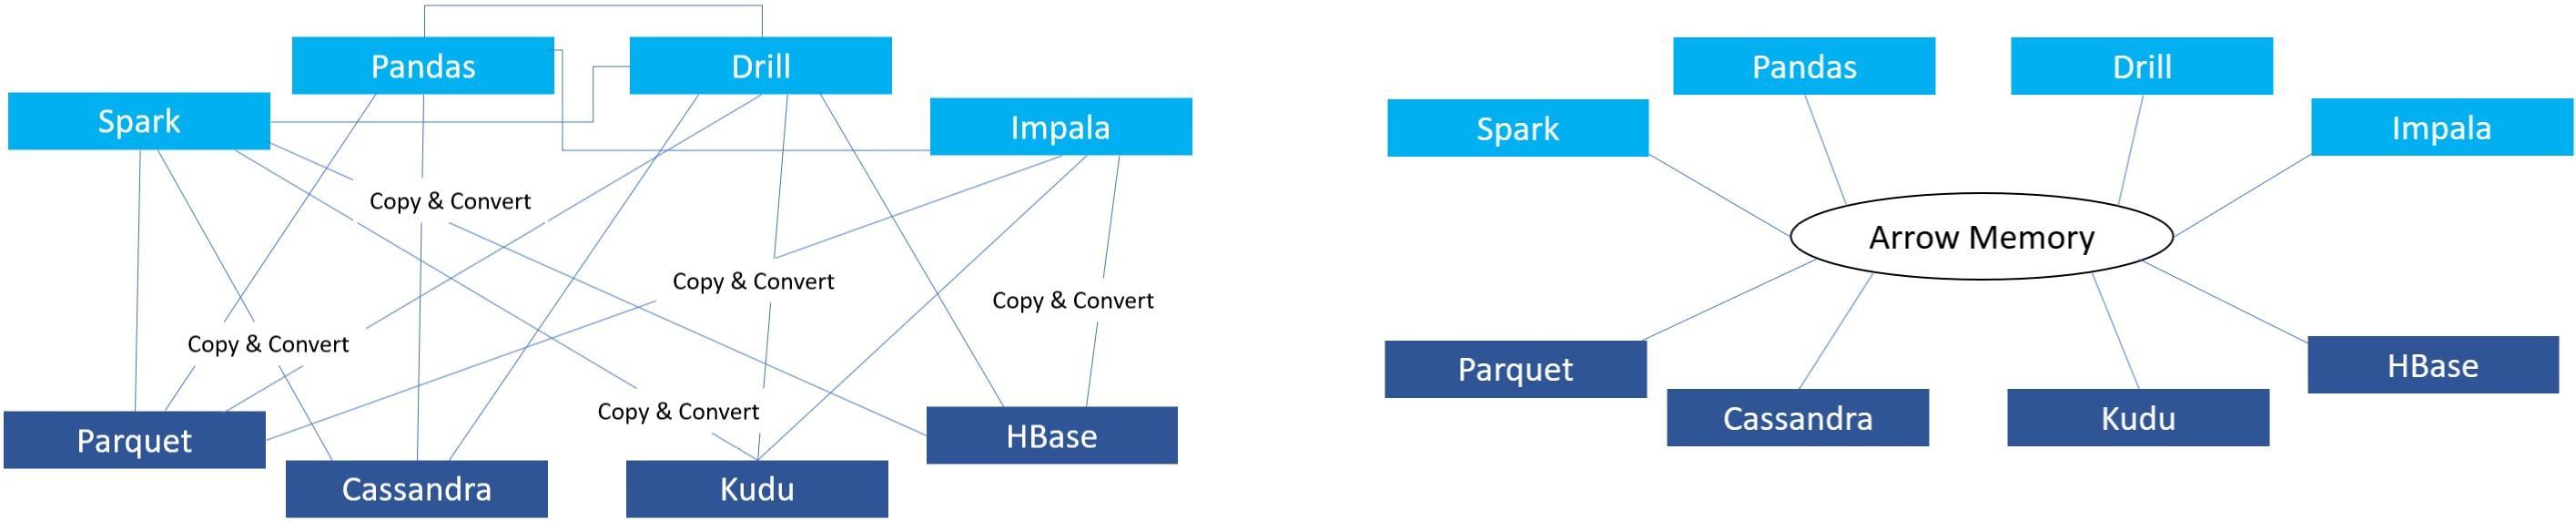 ML-Spark-Apache-1